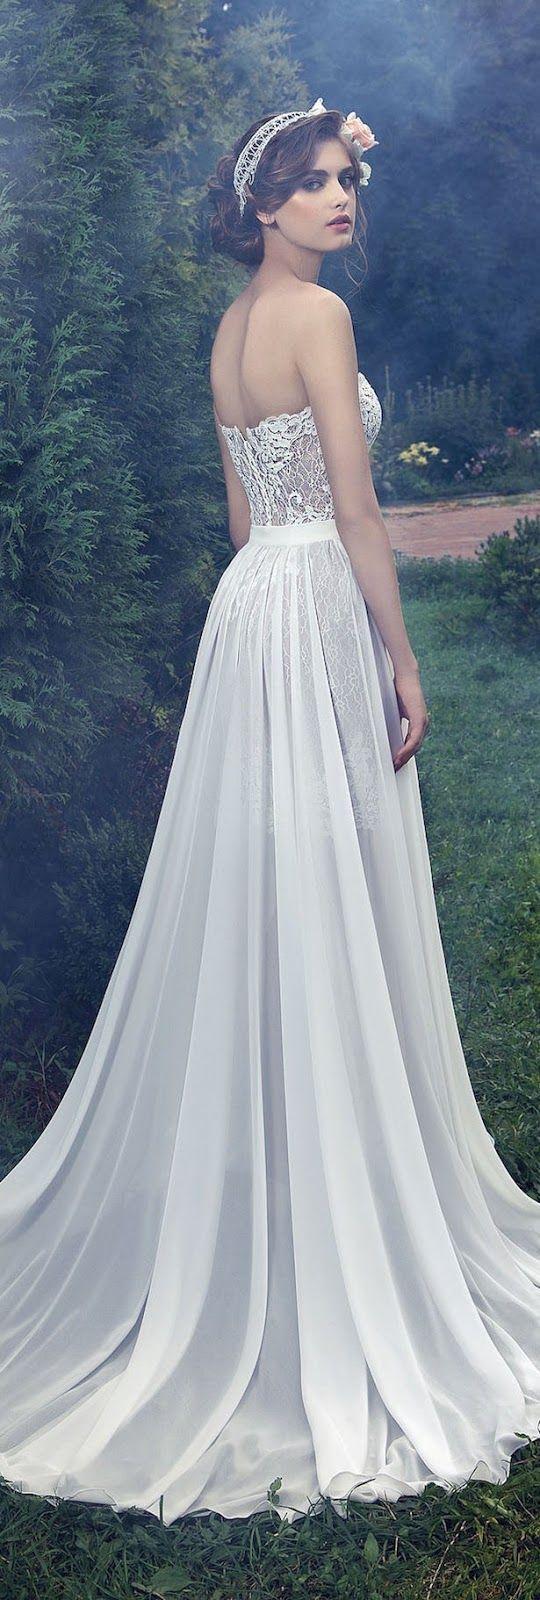 1018 best Novias images on Pinterest | Wedding bride, Wedding ...